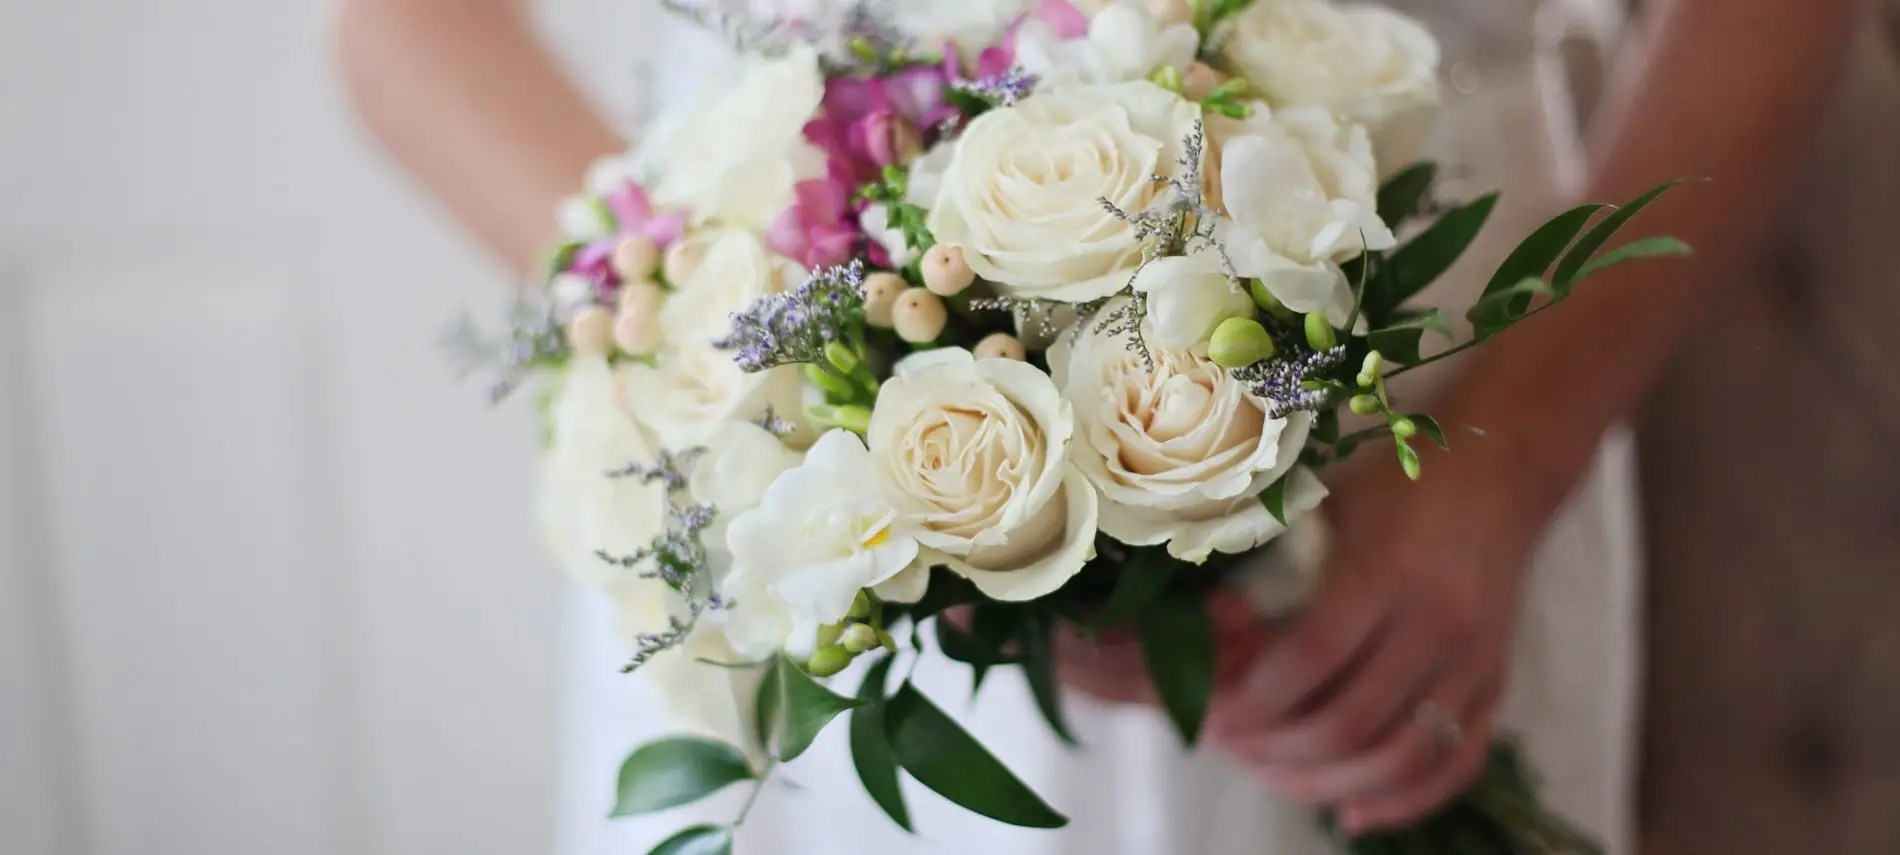 April Showers = Budget Friendly May Wedding Flowers! CGW B&B